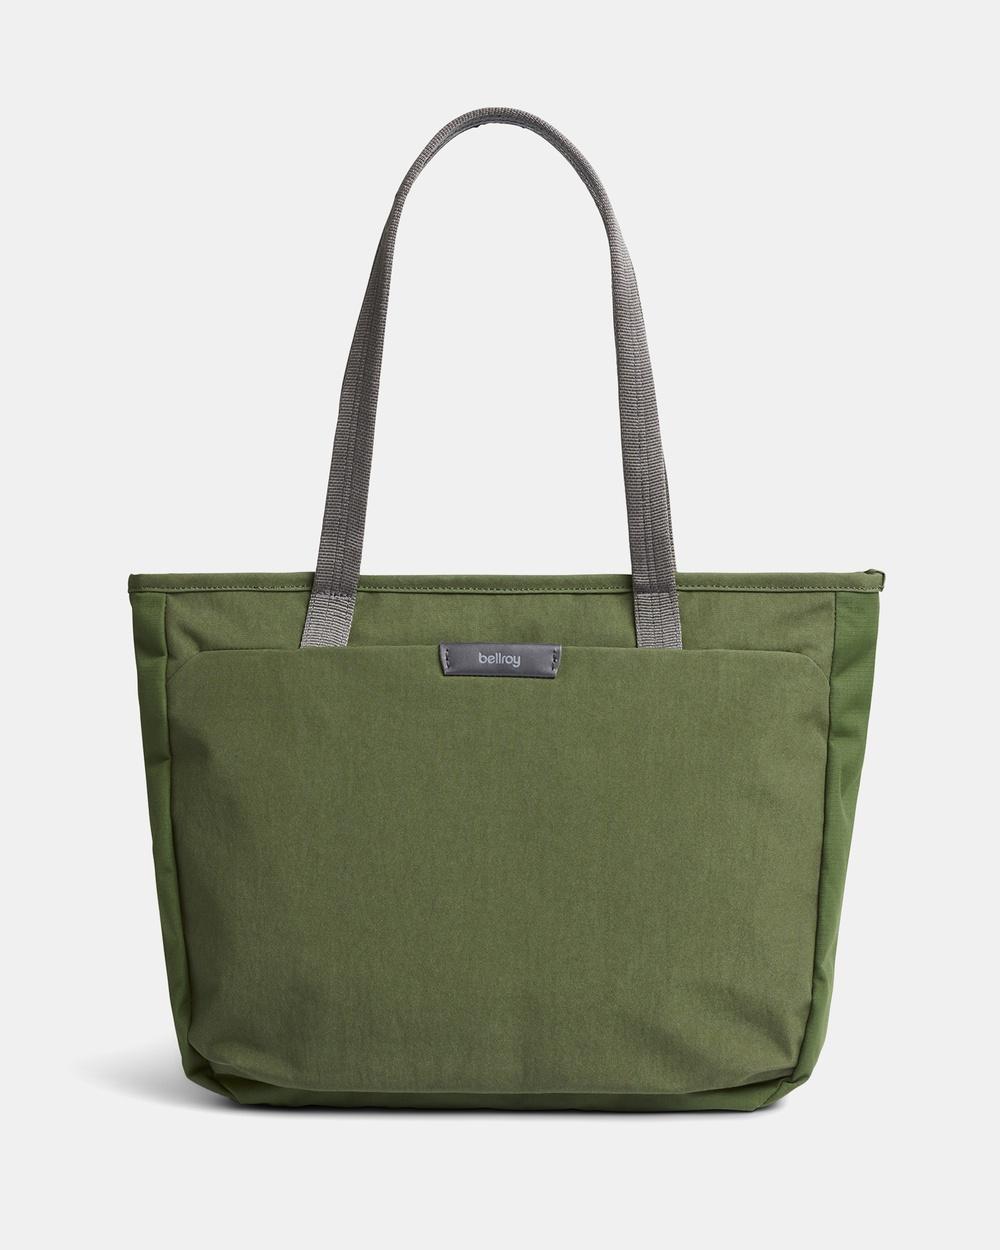 Bellroy Tokyo Tote Compact Handbags Green